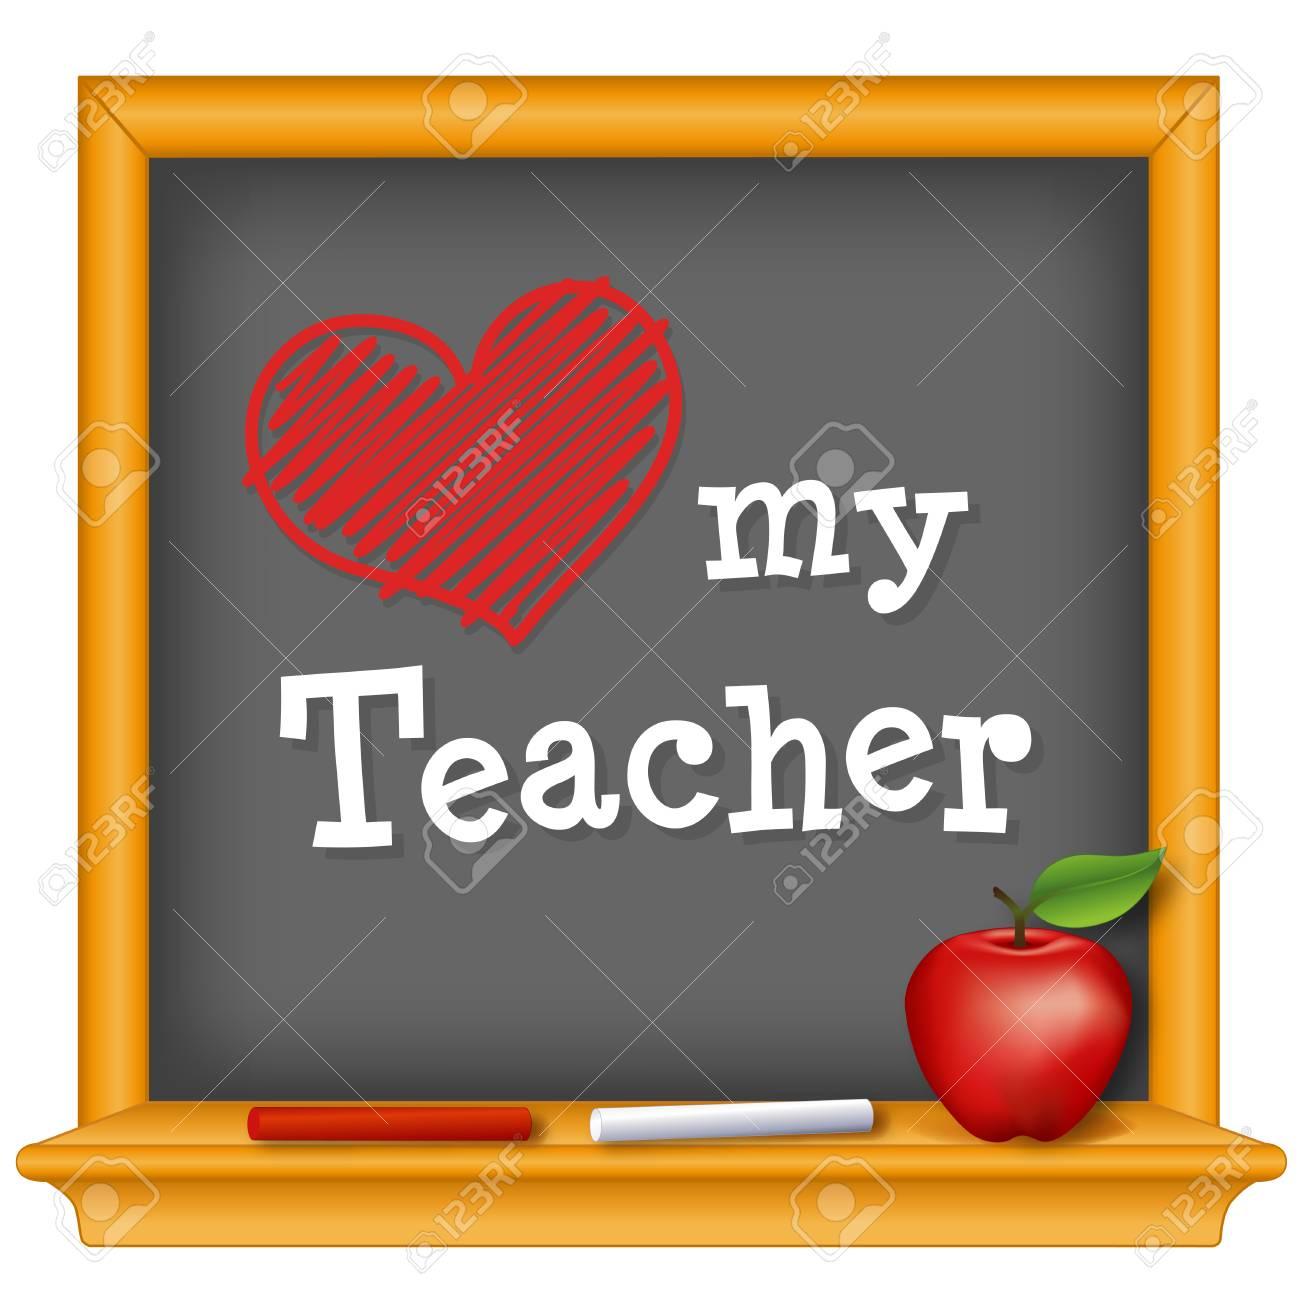 Love my Teacher, red heart on wood frame chalkboard, chalk, big red apple for the teacher. - 121718511